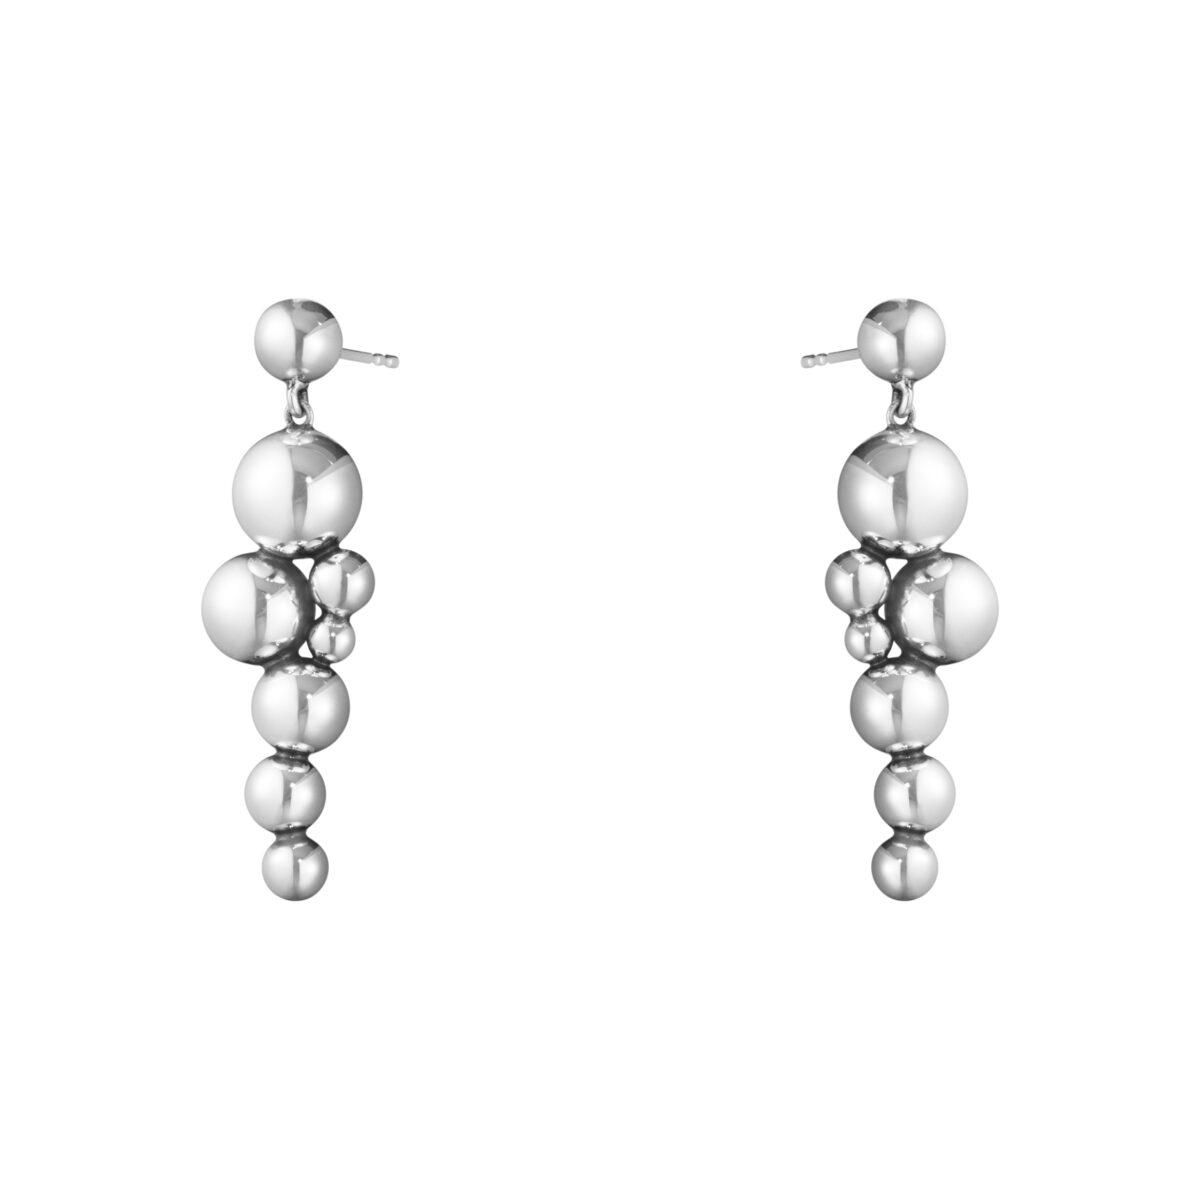 Georg Jensen Moonlight Grapes Earrings